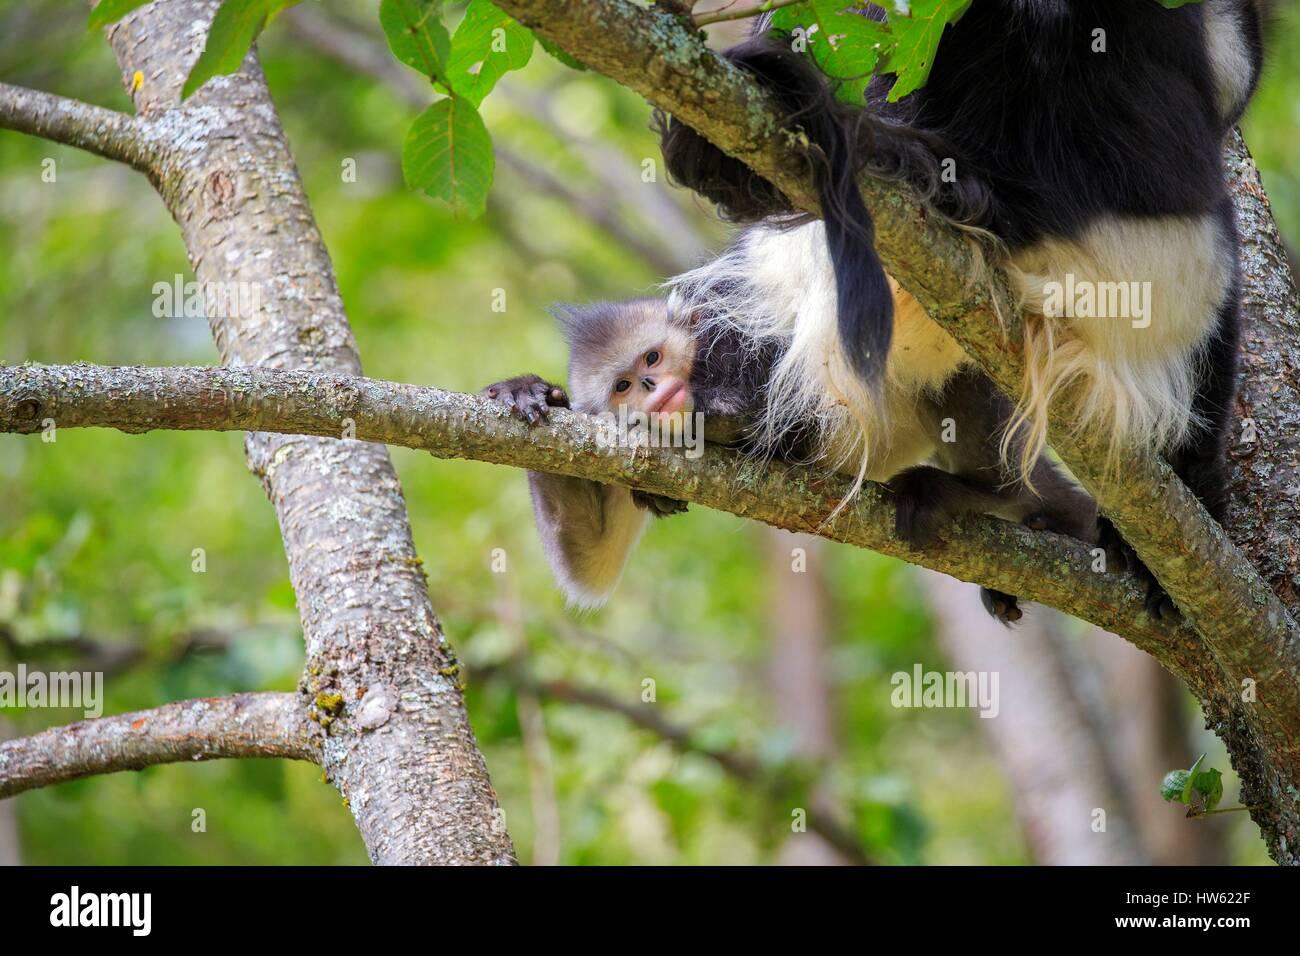 China, Yunnan province, Yunnan Snub-nosed Monkey (Rhinopithecus bieti), mating session Stock Photo